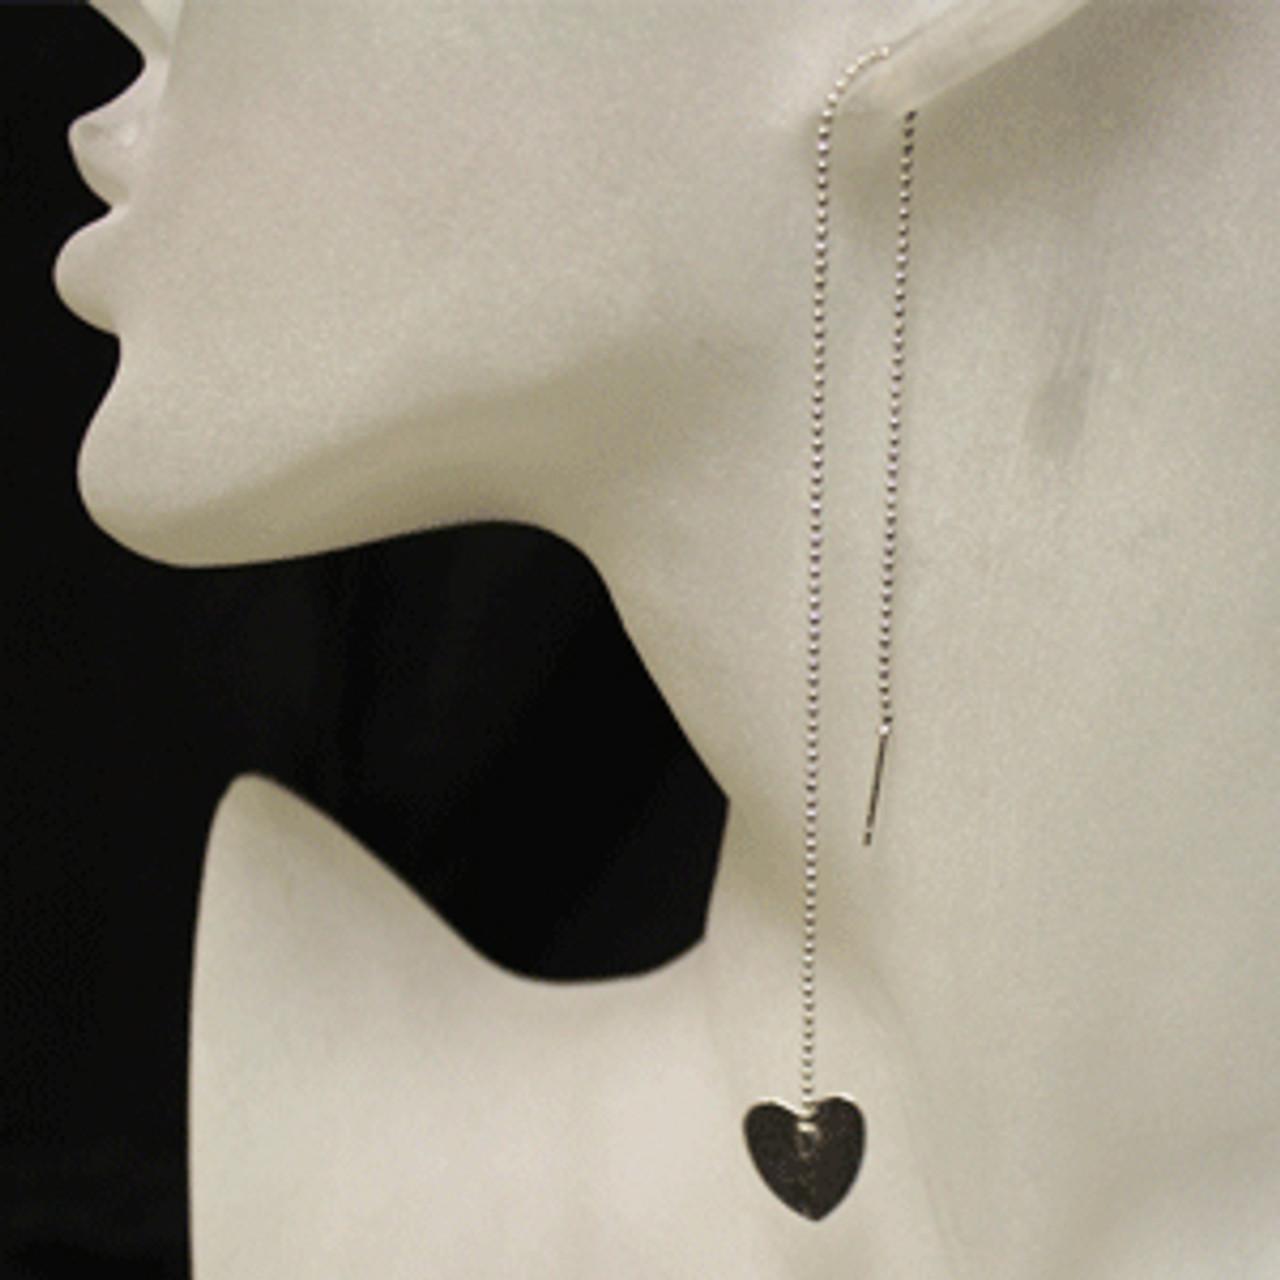 Threaded heart earring